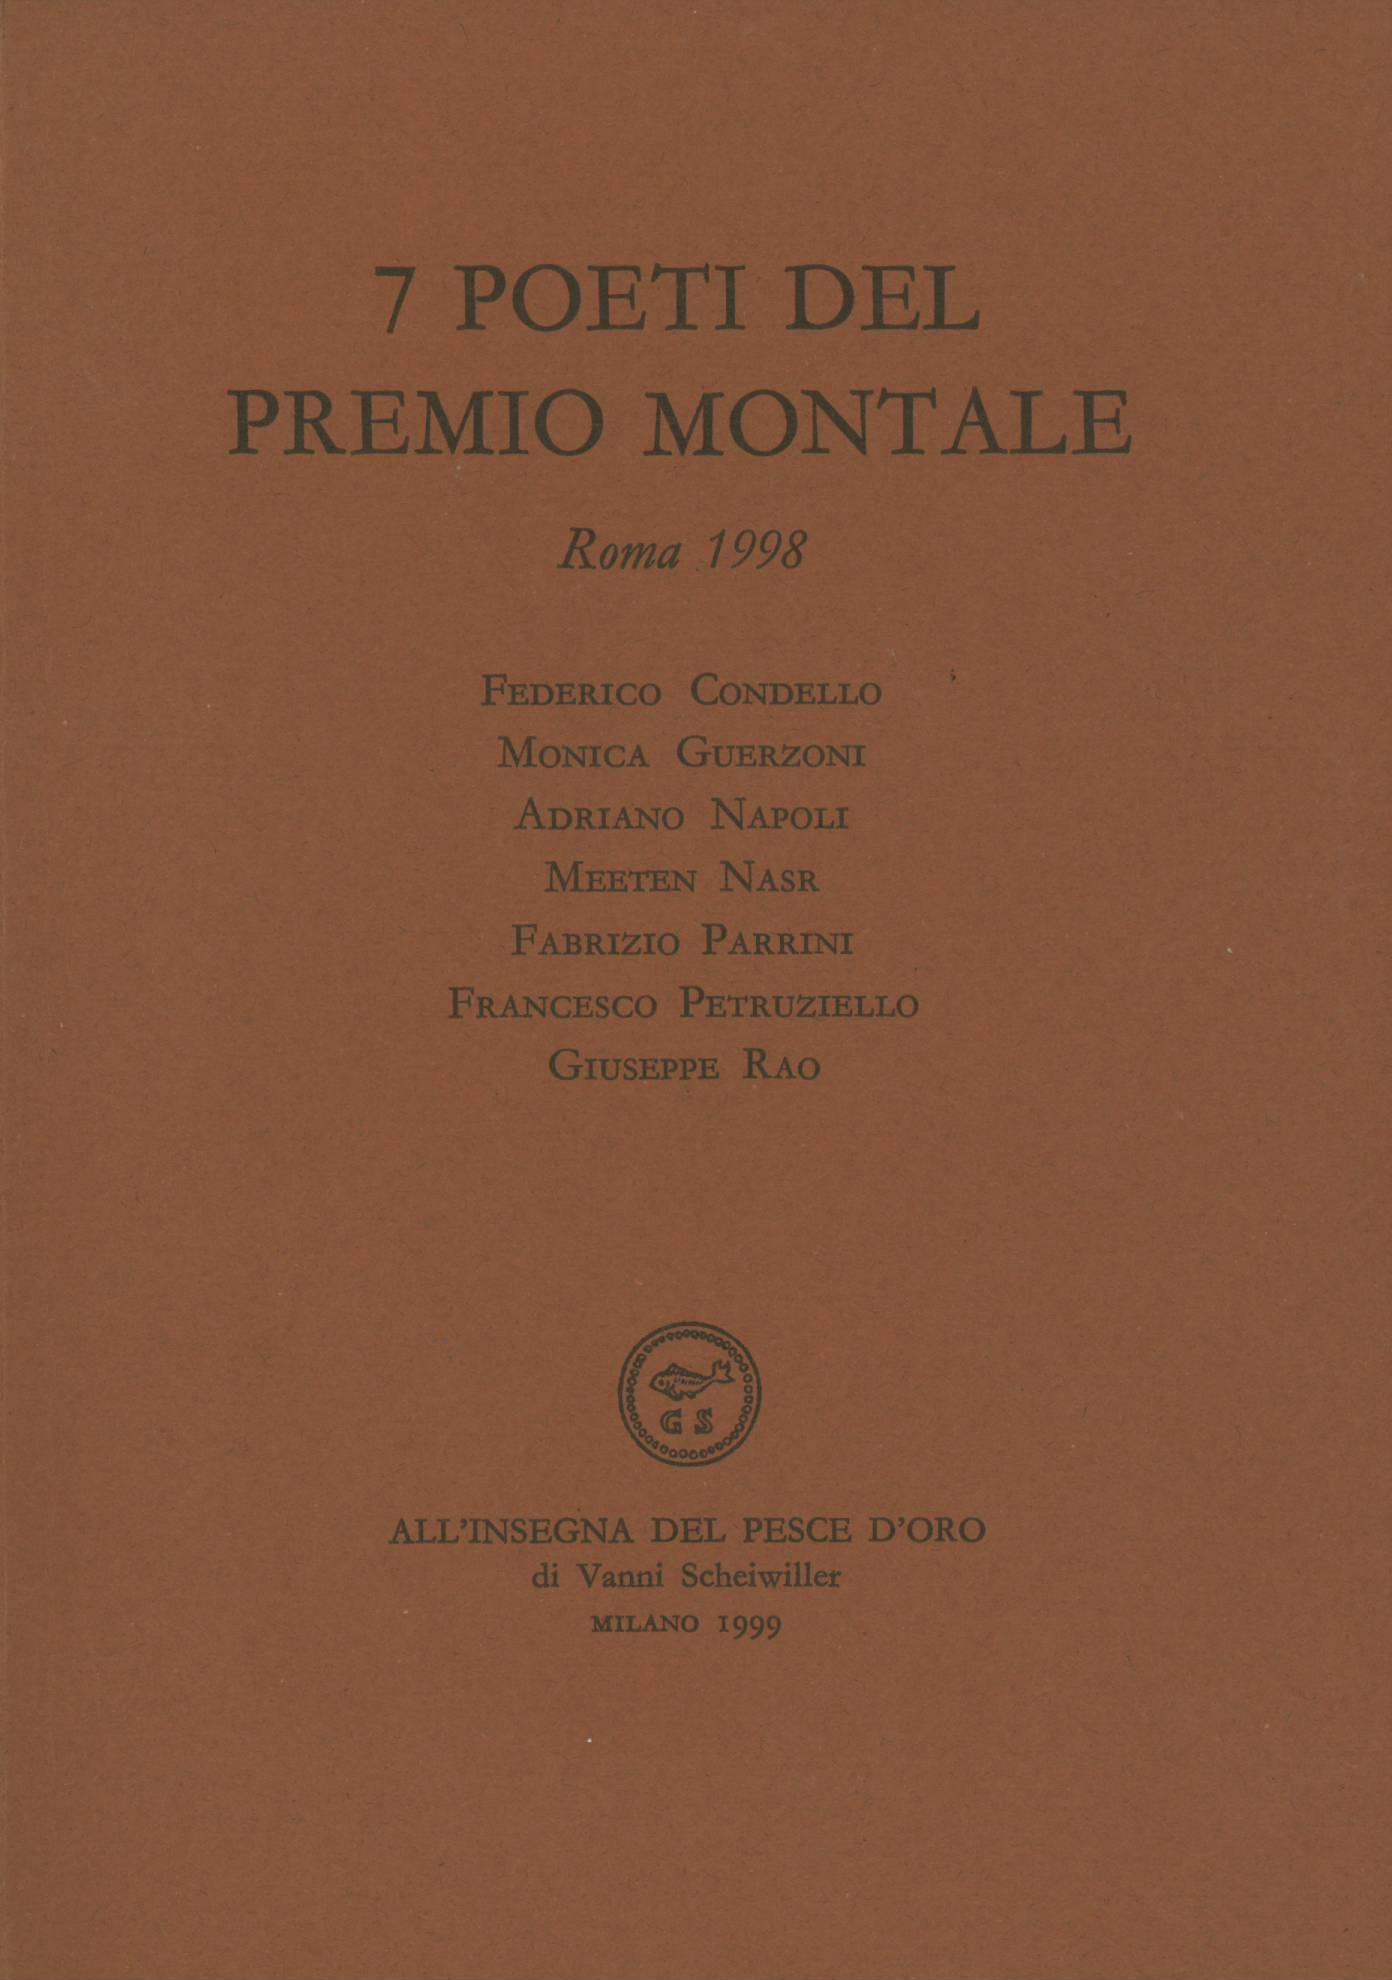 7 poeti del Premio Montale